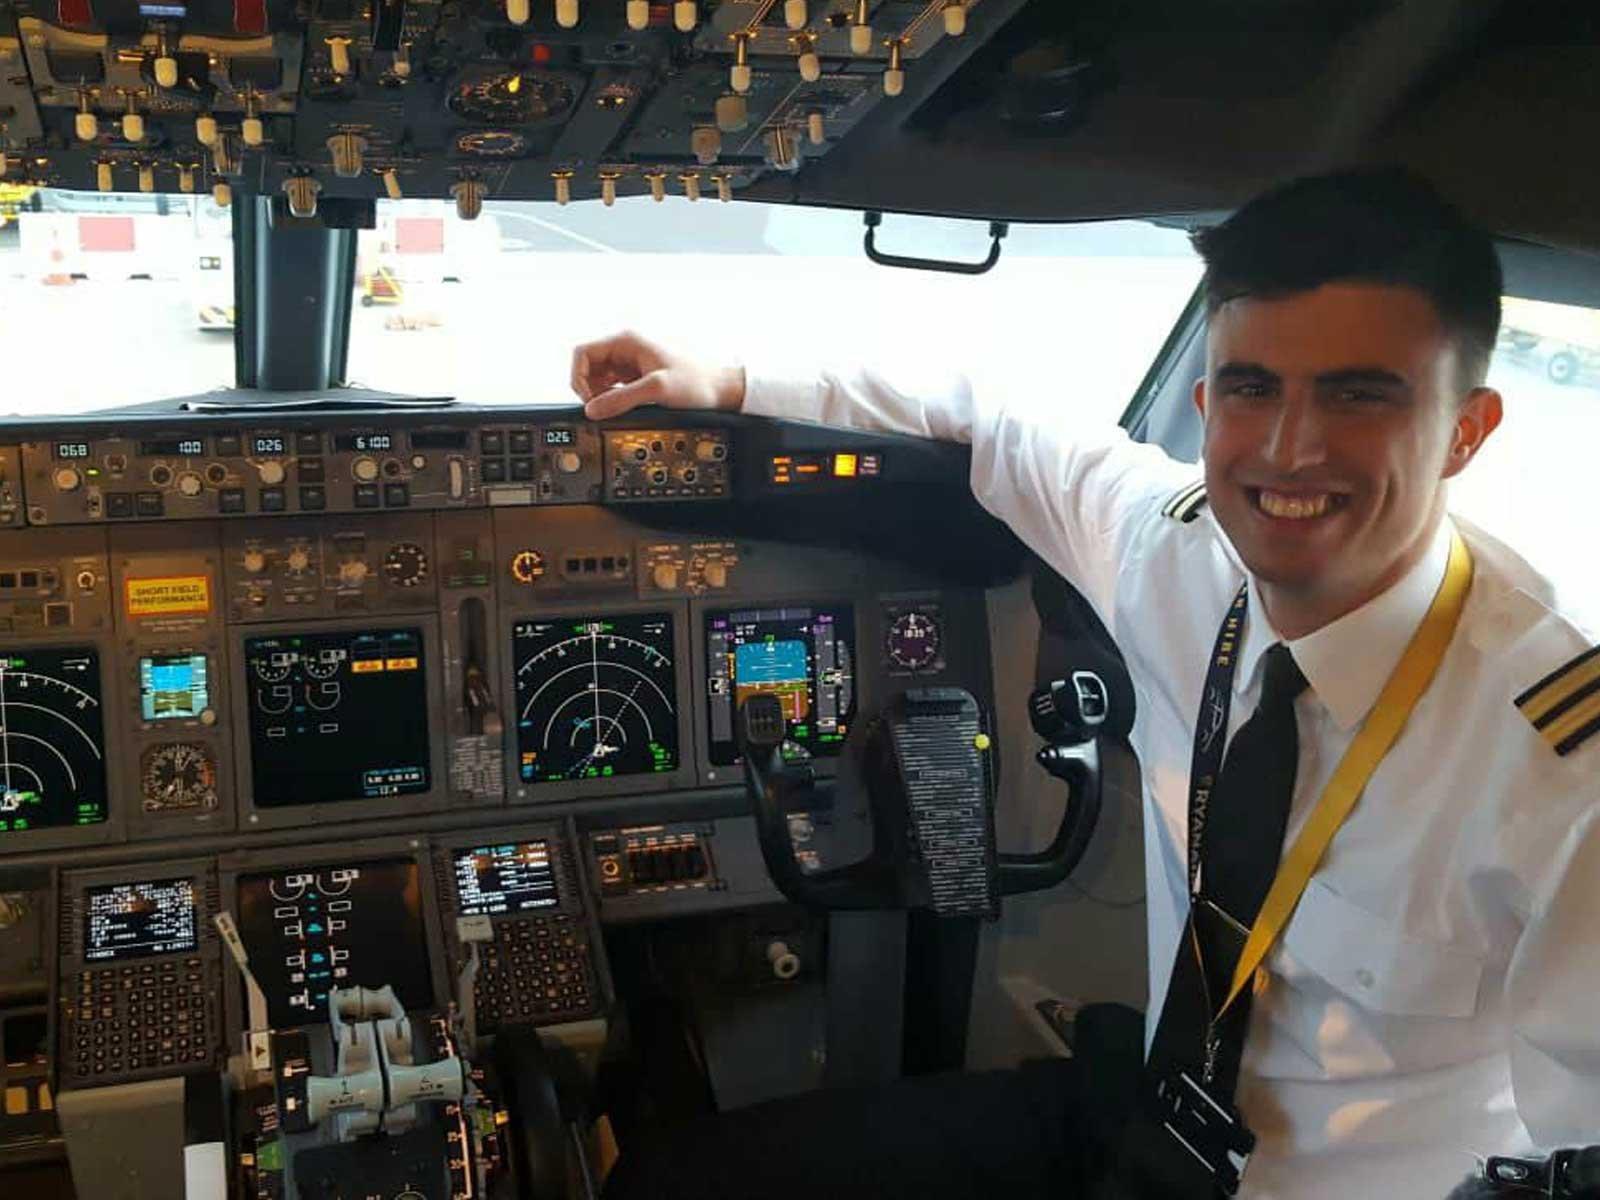 Alessandro pilot for Ryanair